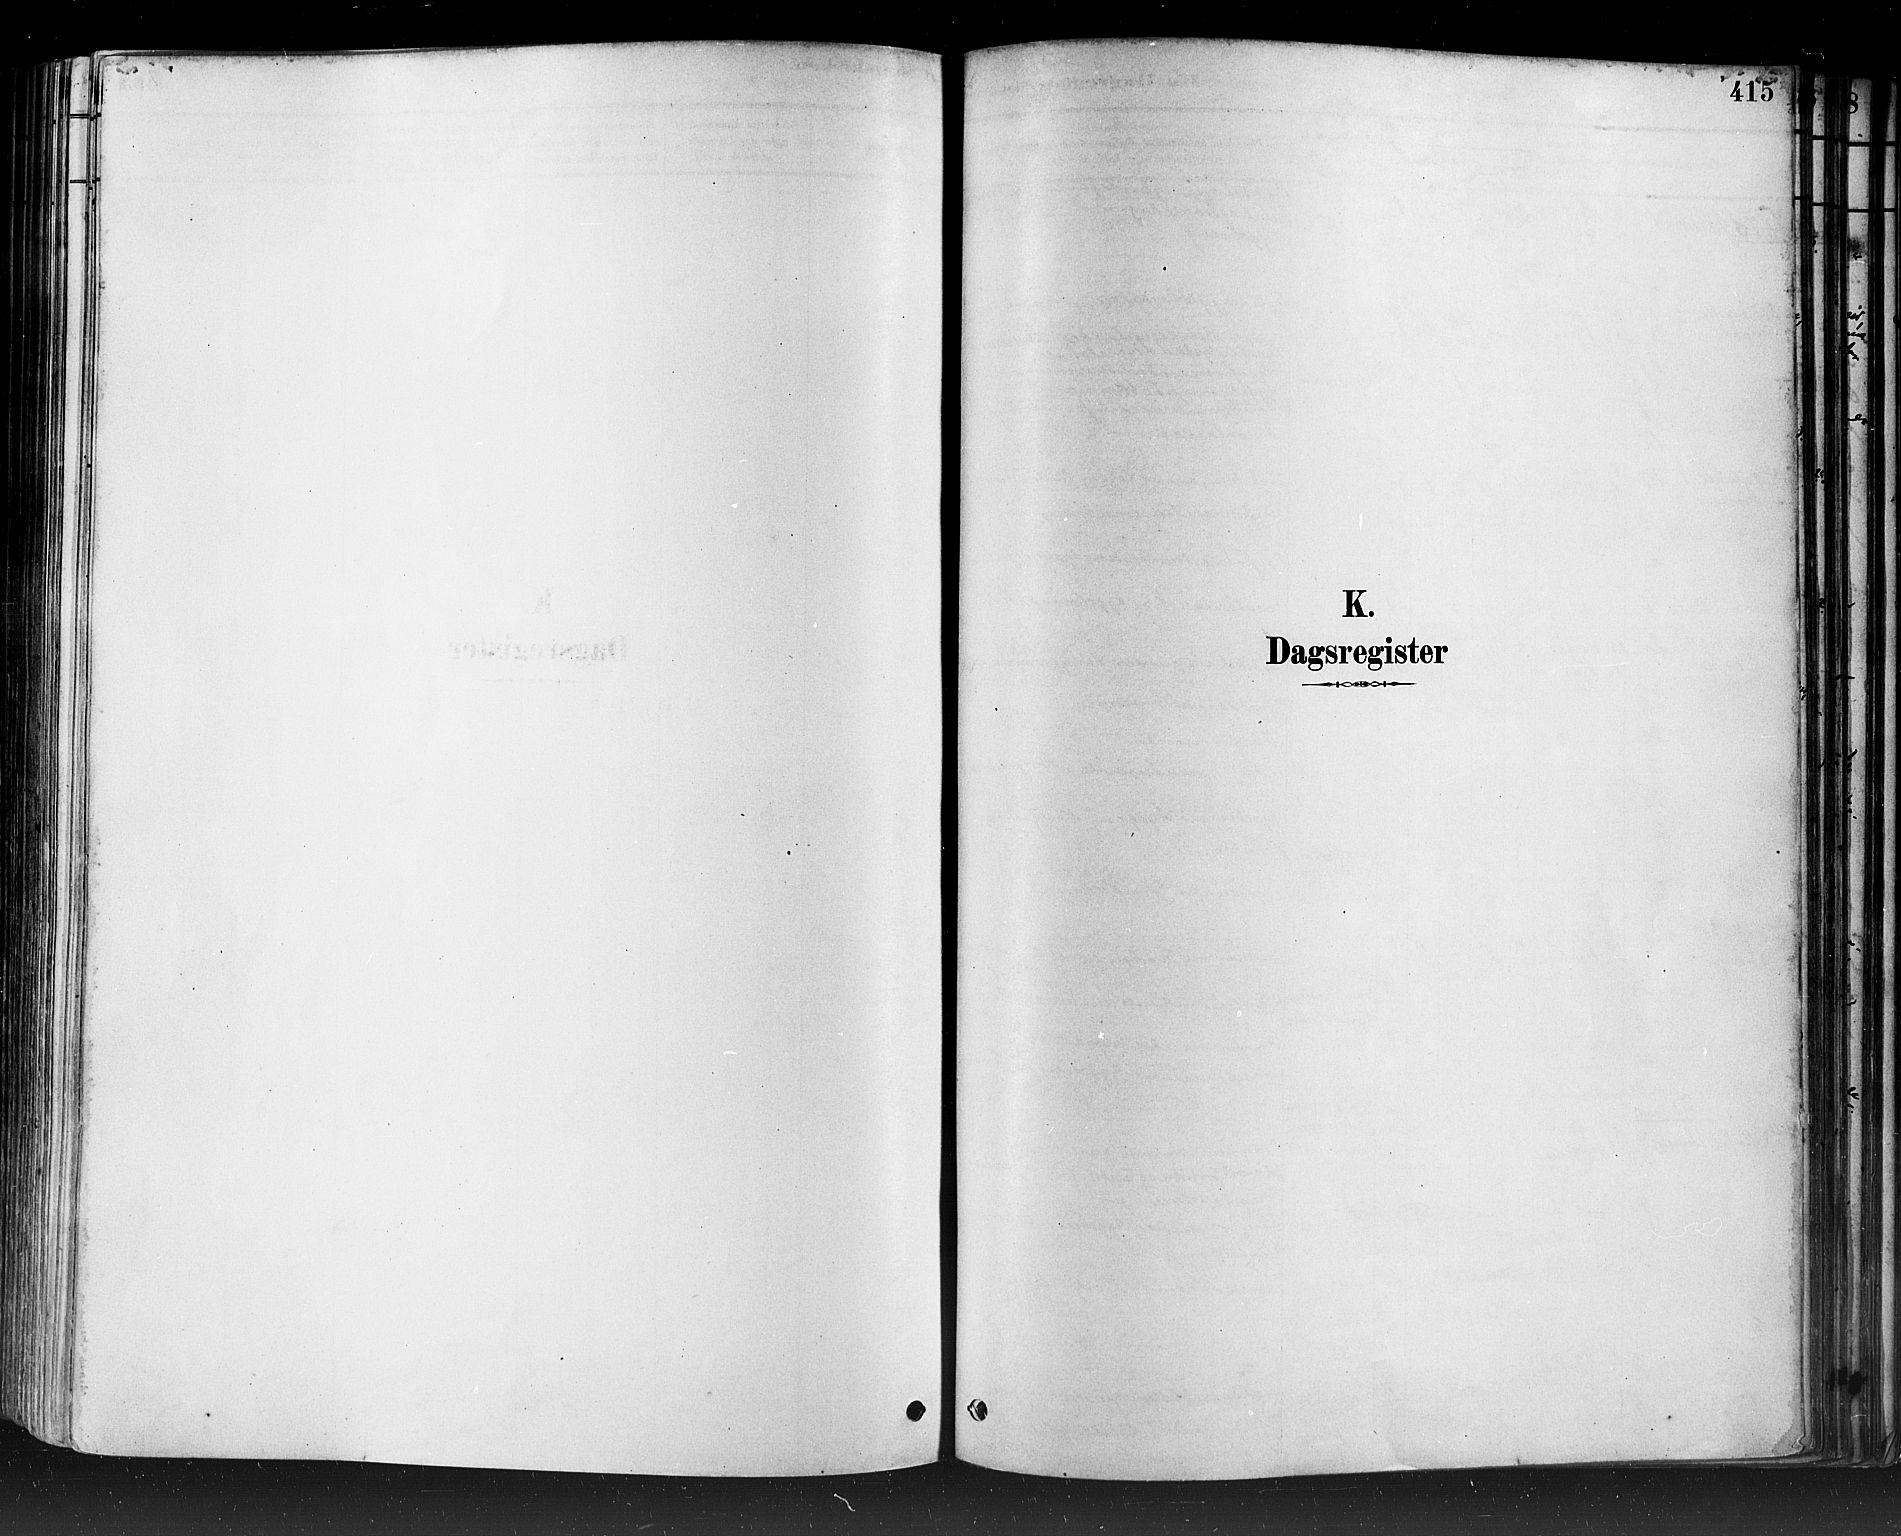 SAKO, Eiker kirkebøker, F/Fb/L0001: Ministerialbok nr. II 1, 1878-1888, s. 415